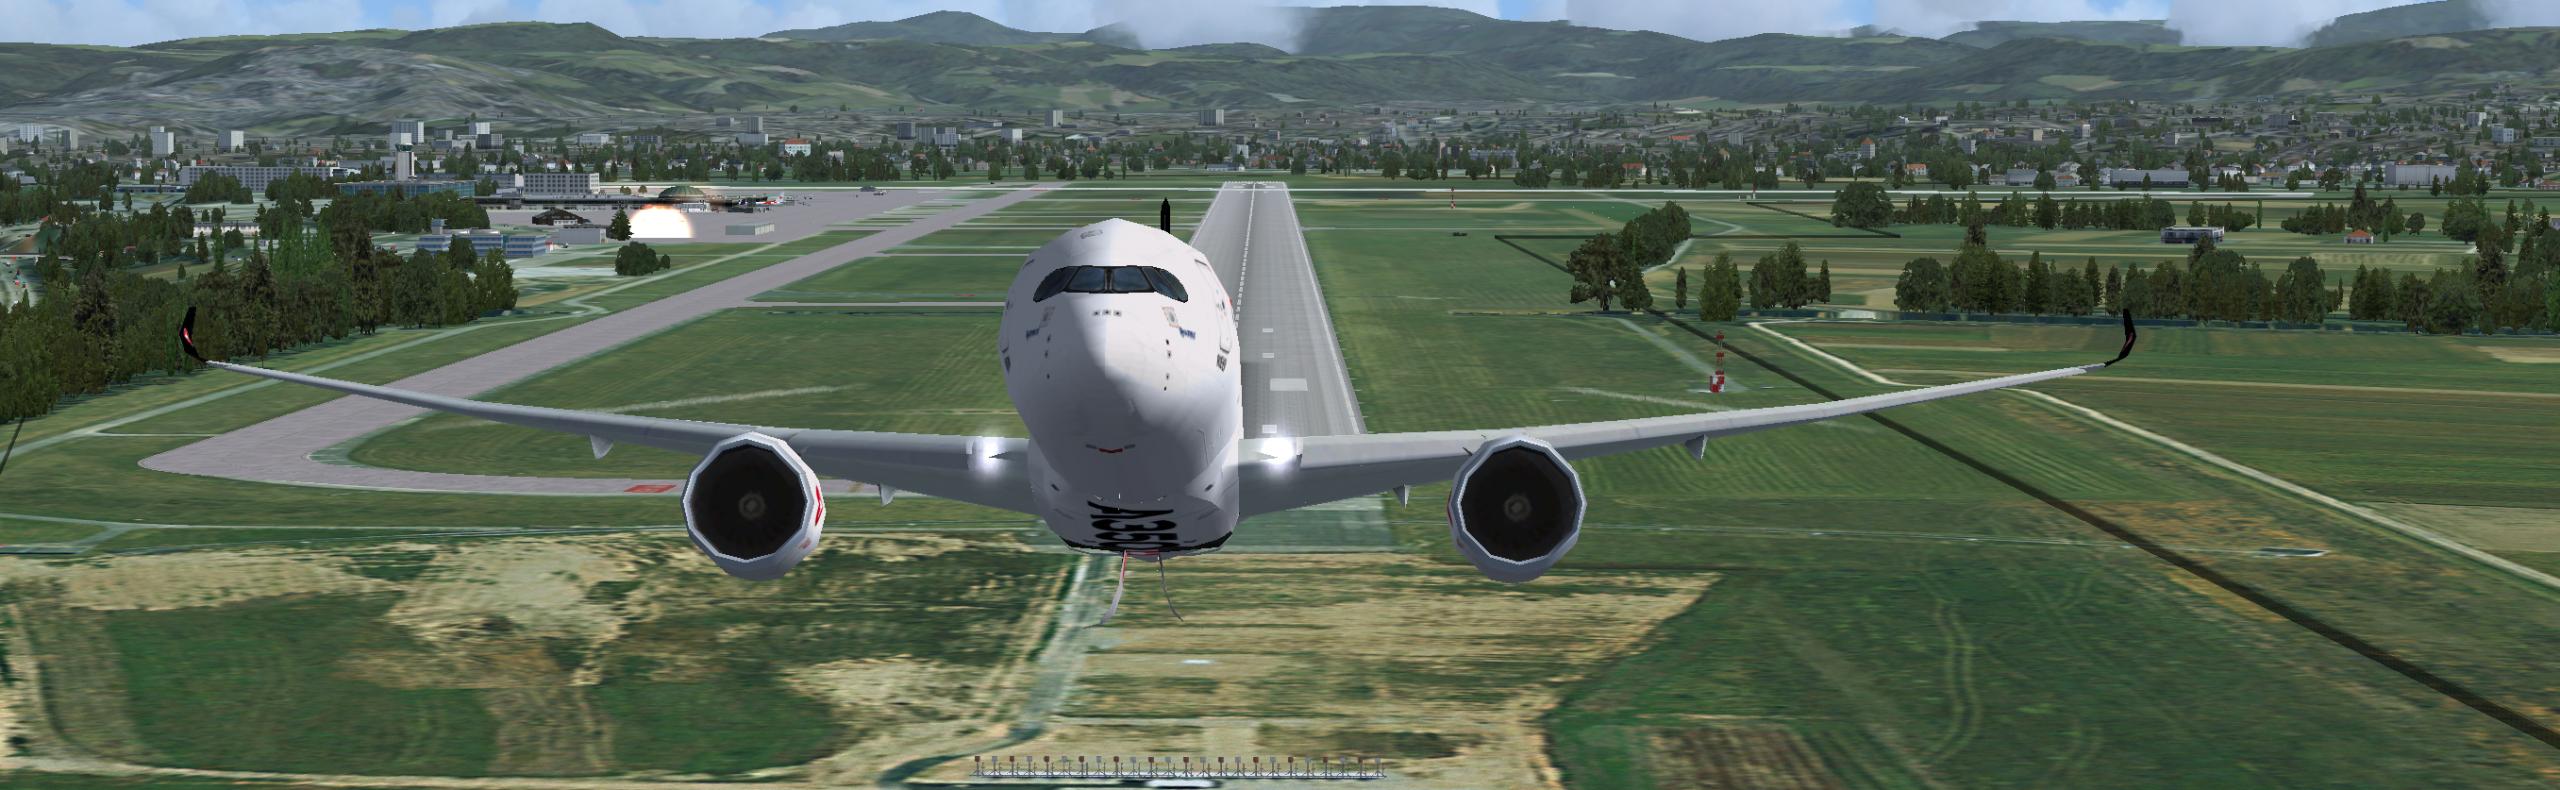 , Werde zum Pilot deines eigenen Lebens: Lebenspilot